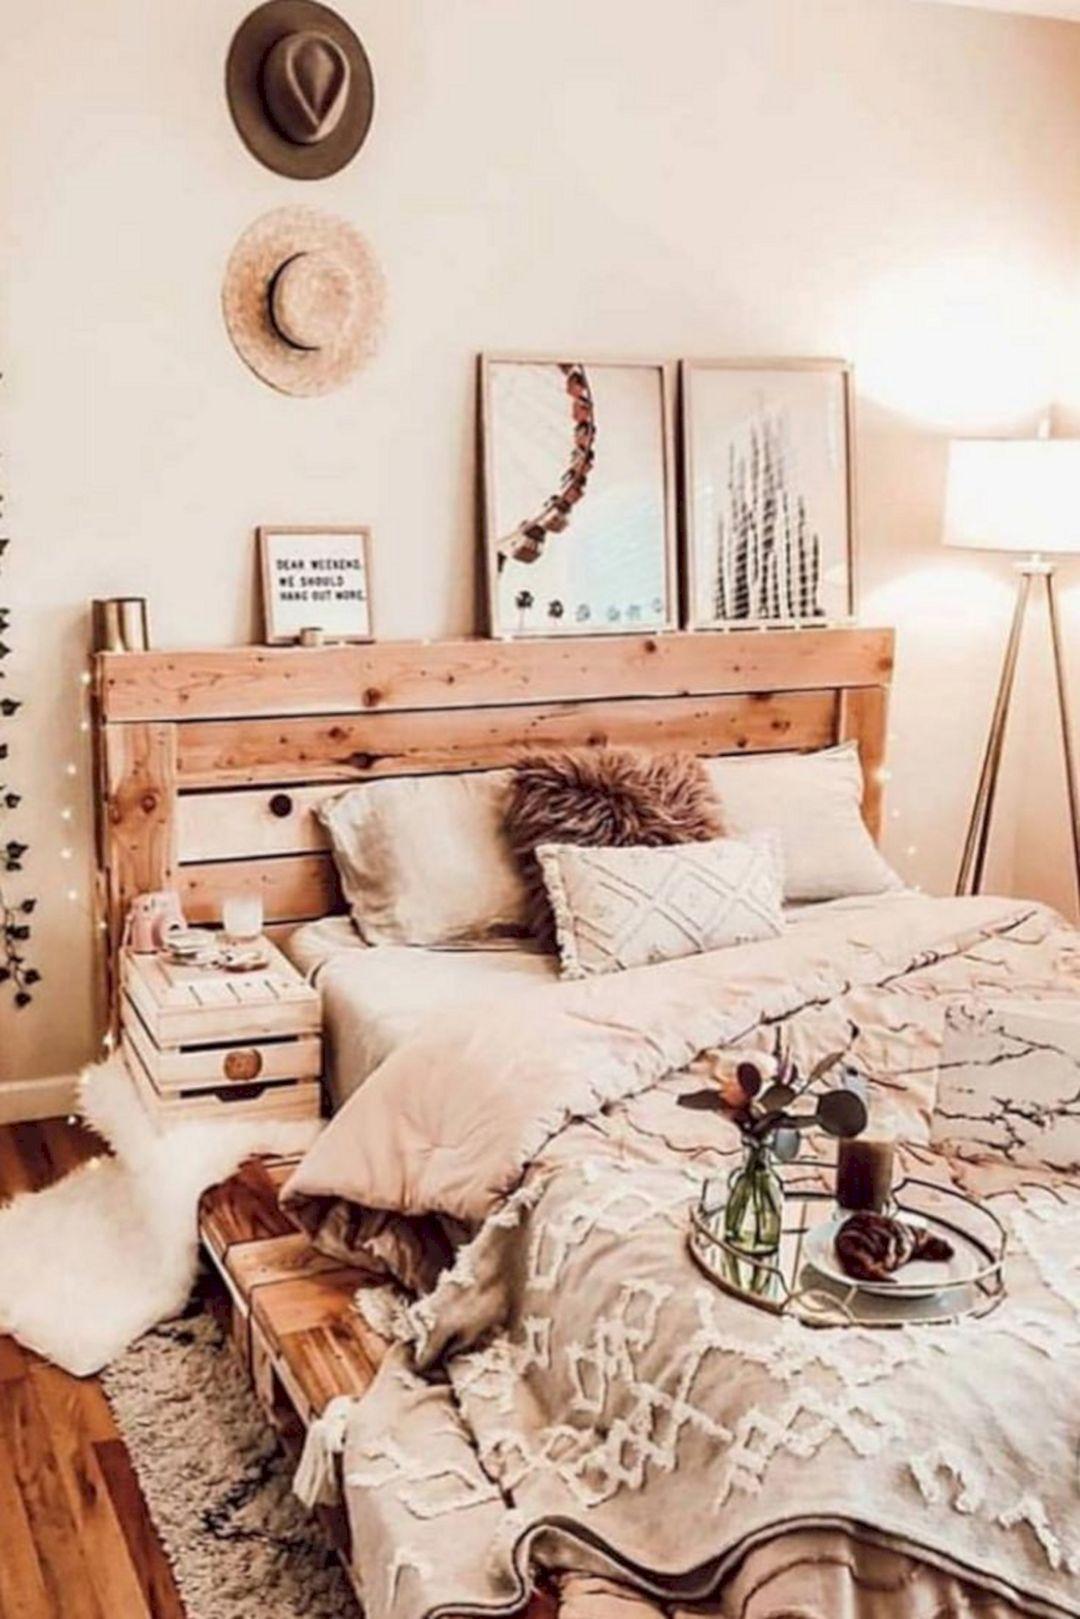 10 Wonderful Bohemian Minimalist Bedroom Ideas You Have To See